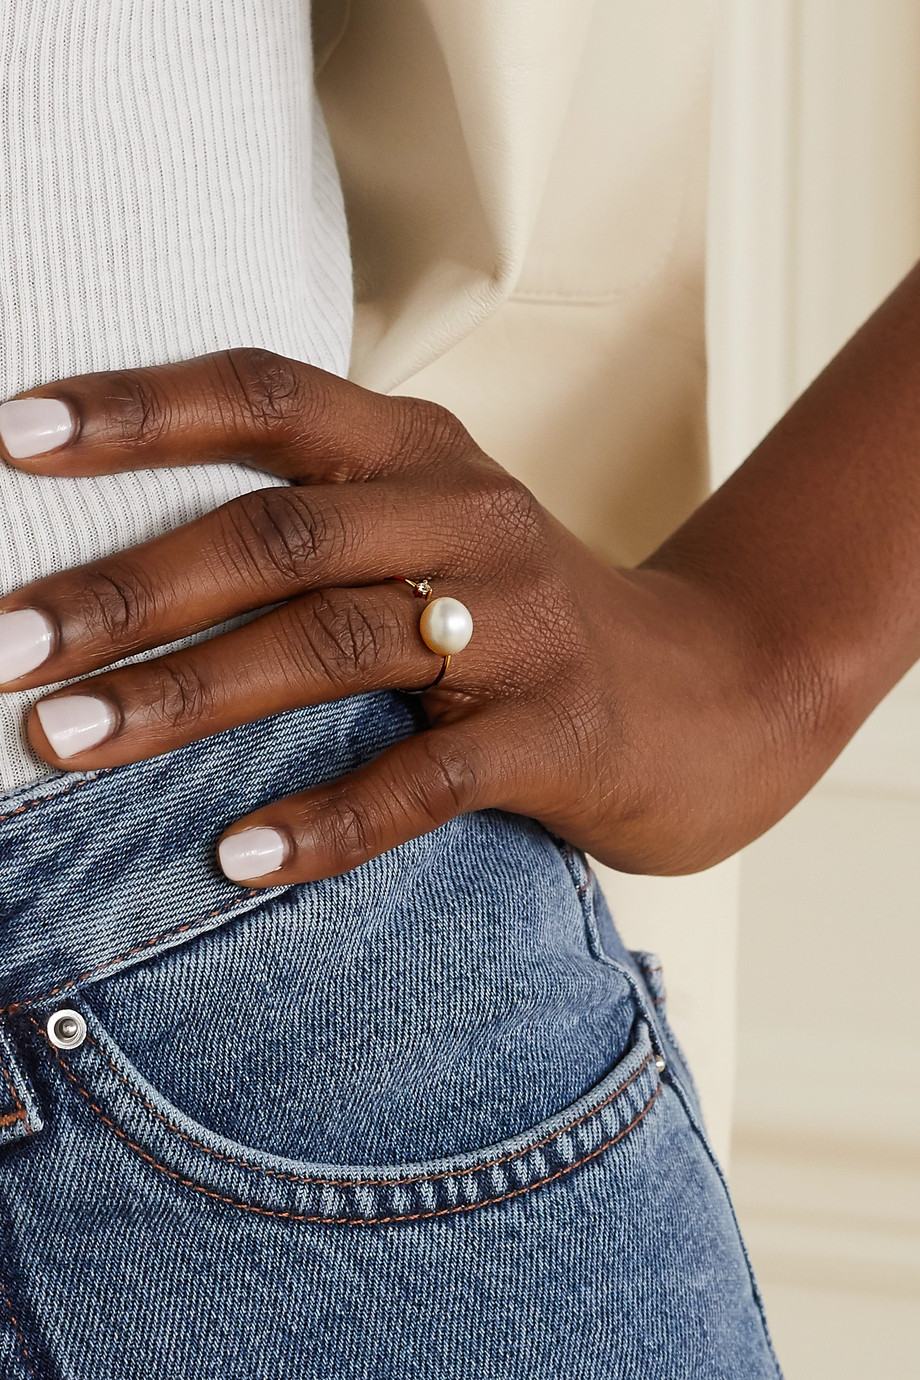 Mizuki Bague en or 14 carats, perle et diamant